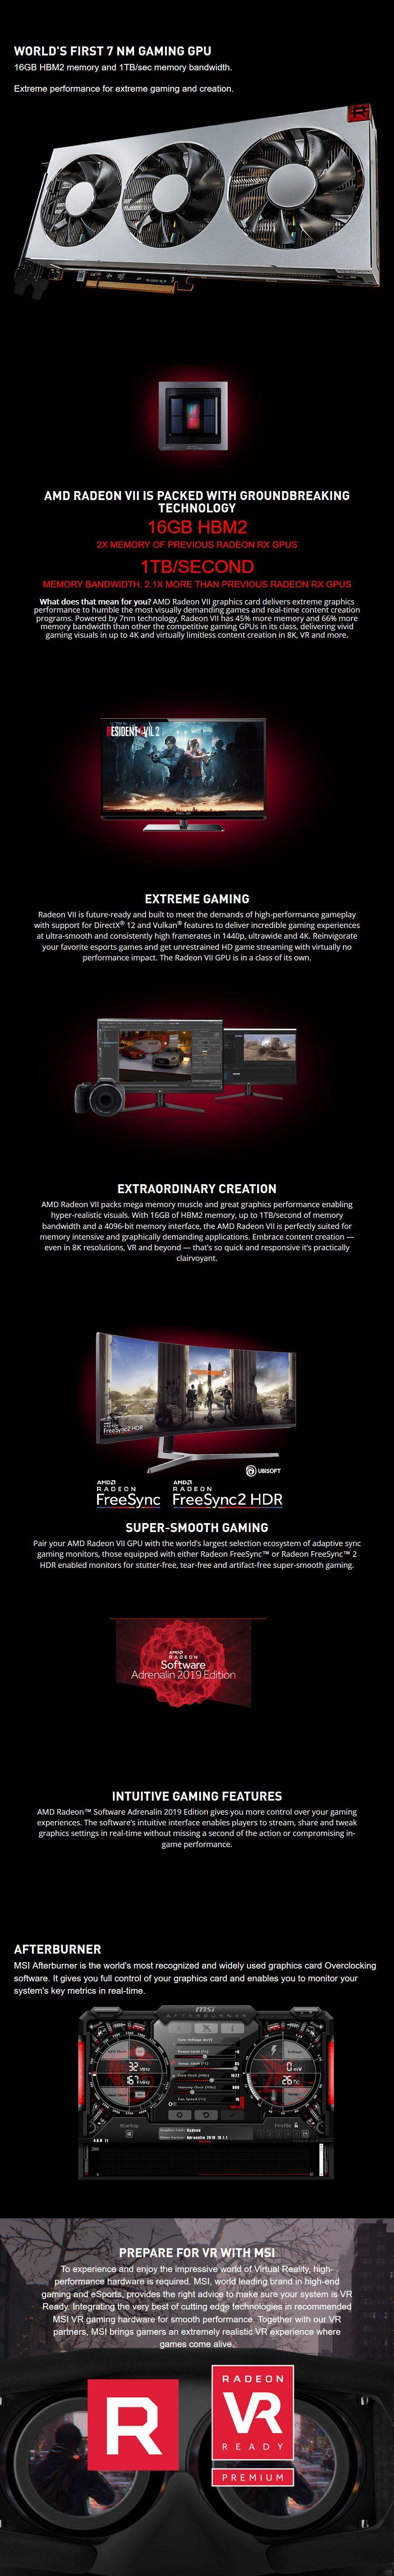 MSI Radeon VII 16GB Video Card - MSI Radeon VII 16GB | Mwave